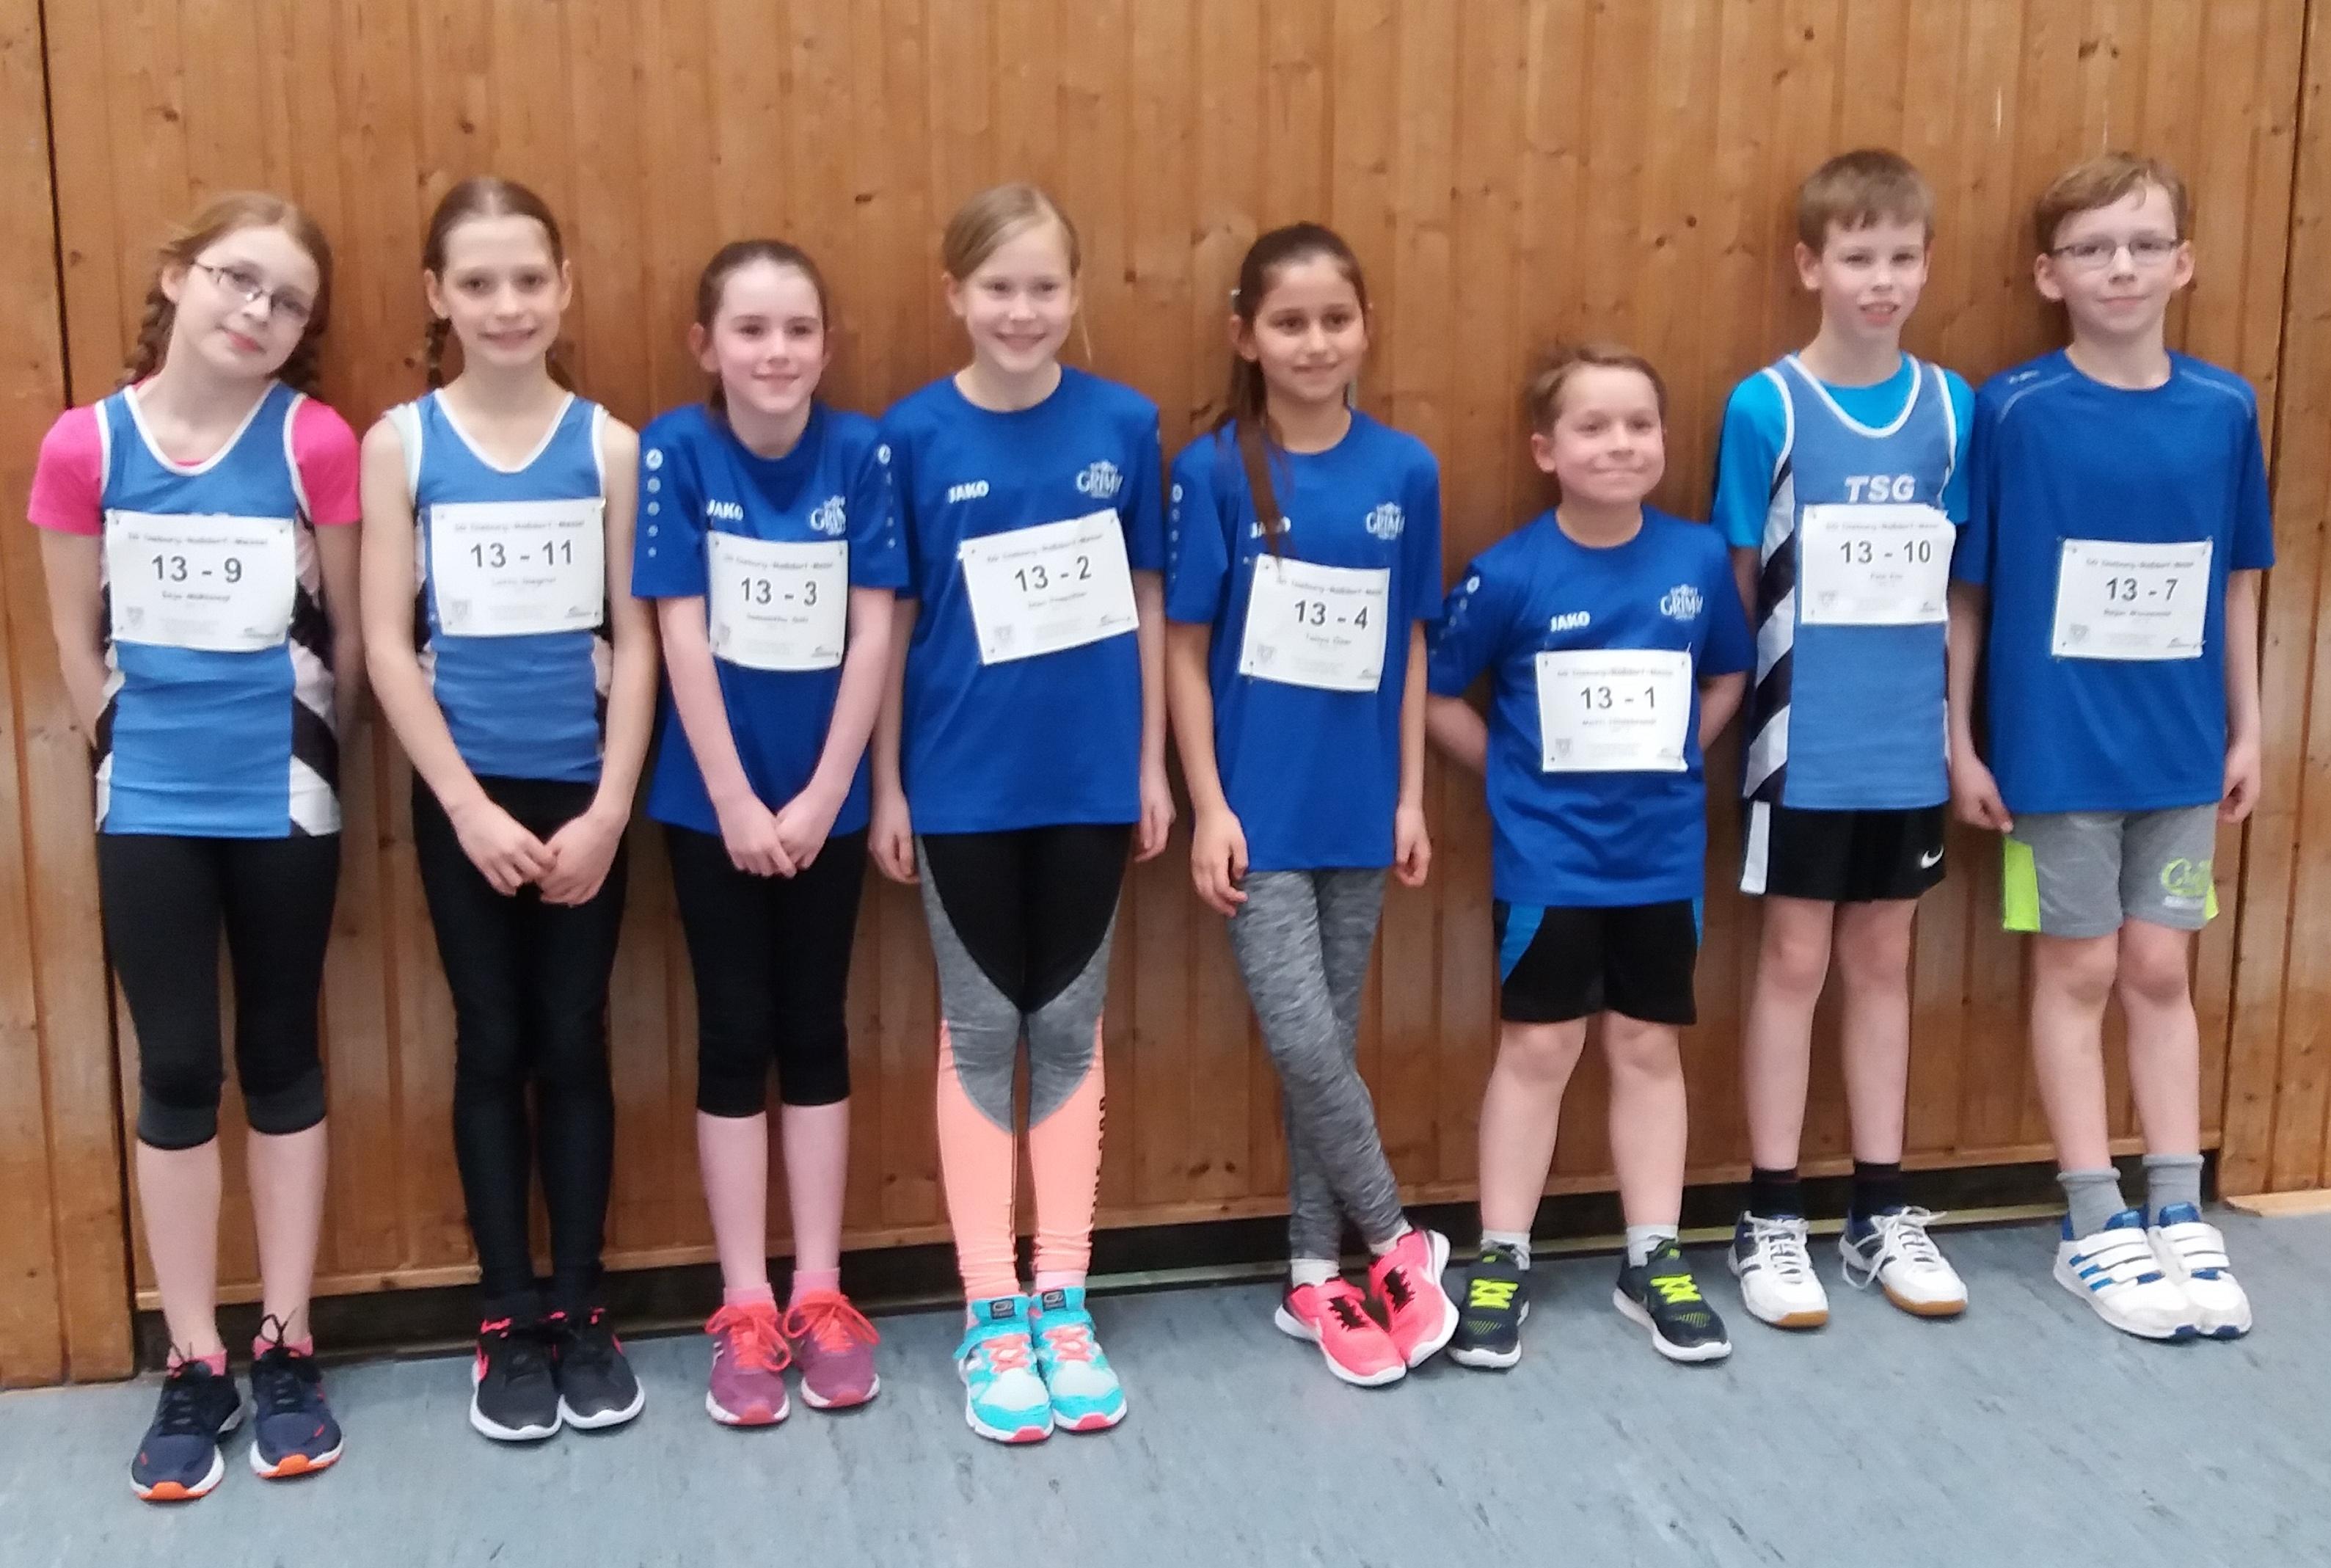 1. Wettkampf der Kinder-Leichtathletik-Liga (KiLa) 2019 der U12